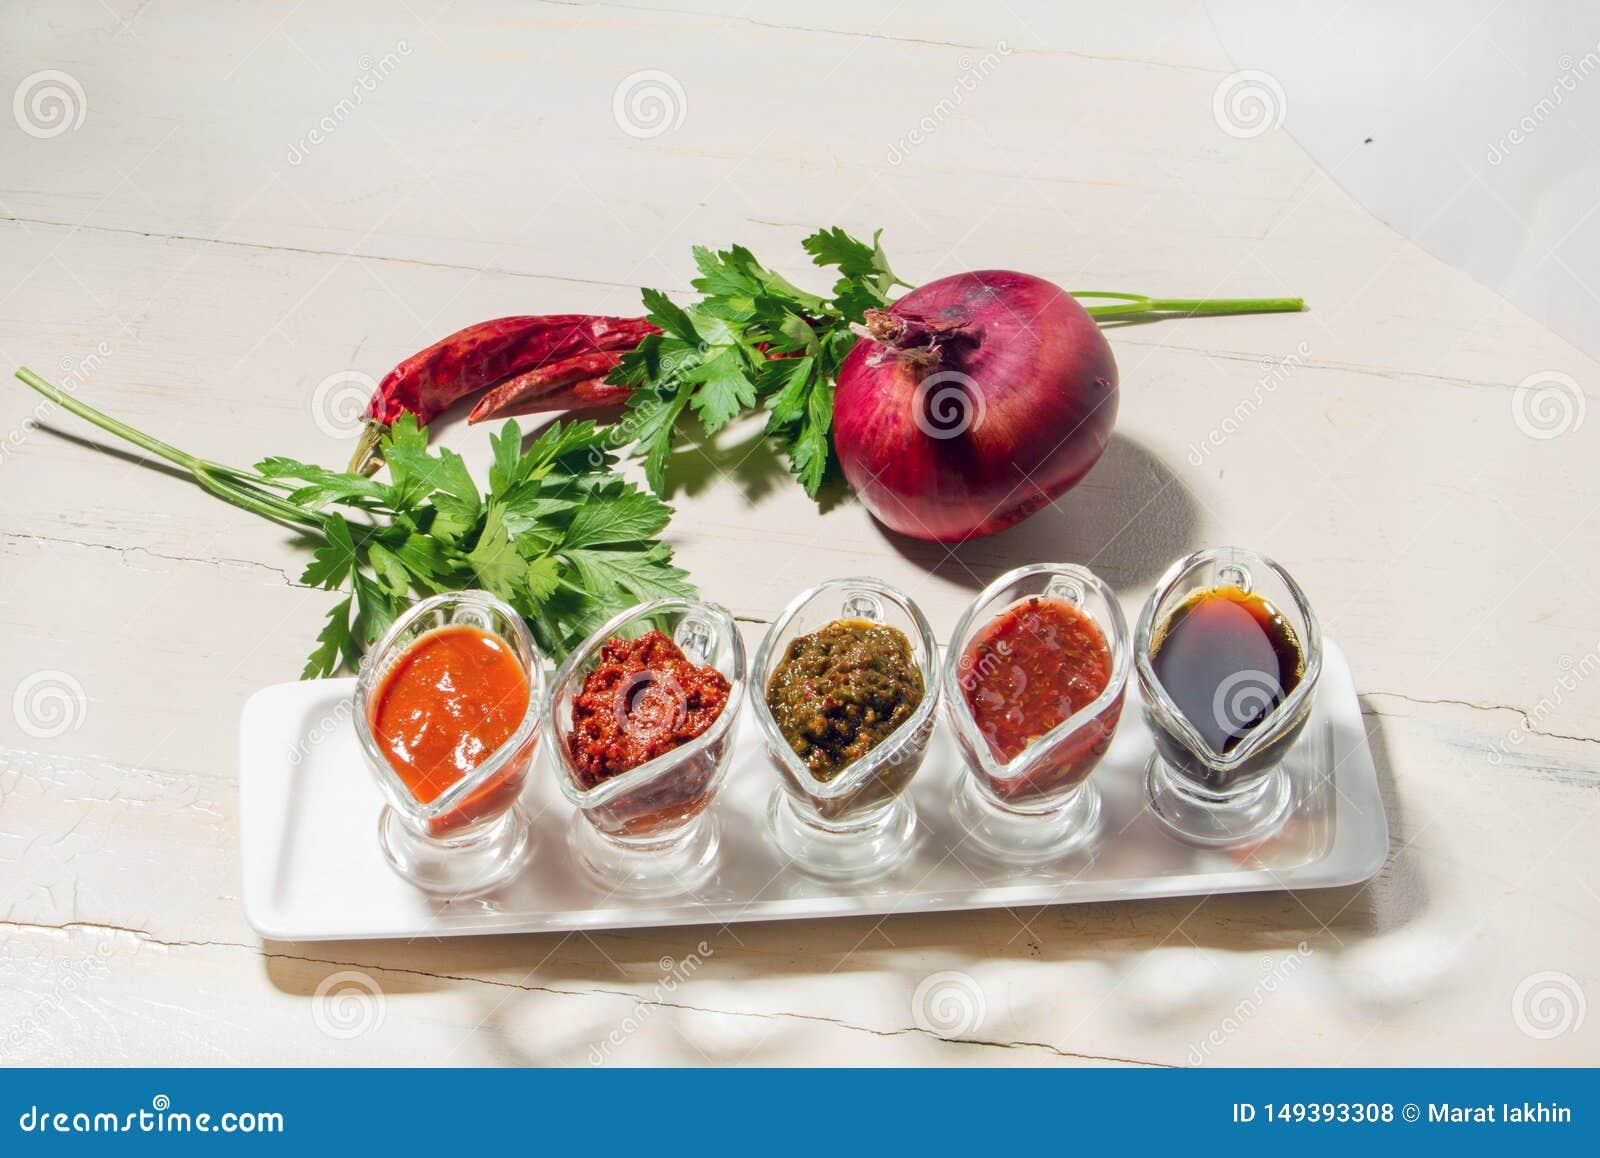 Georgian seasonings and sauces